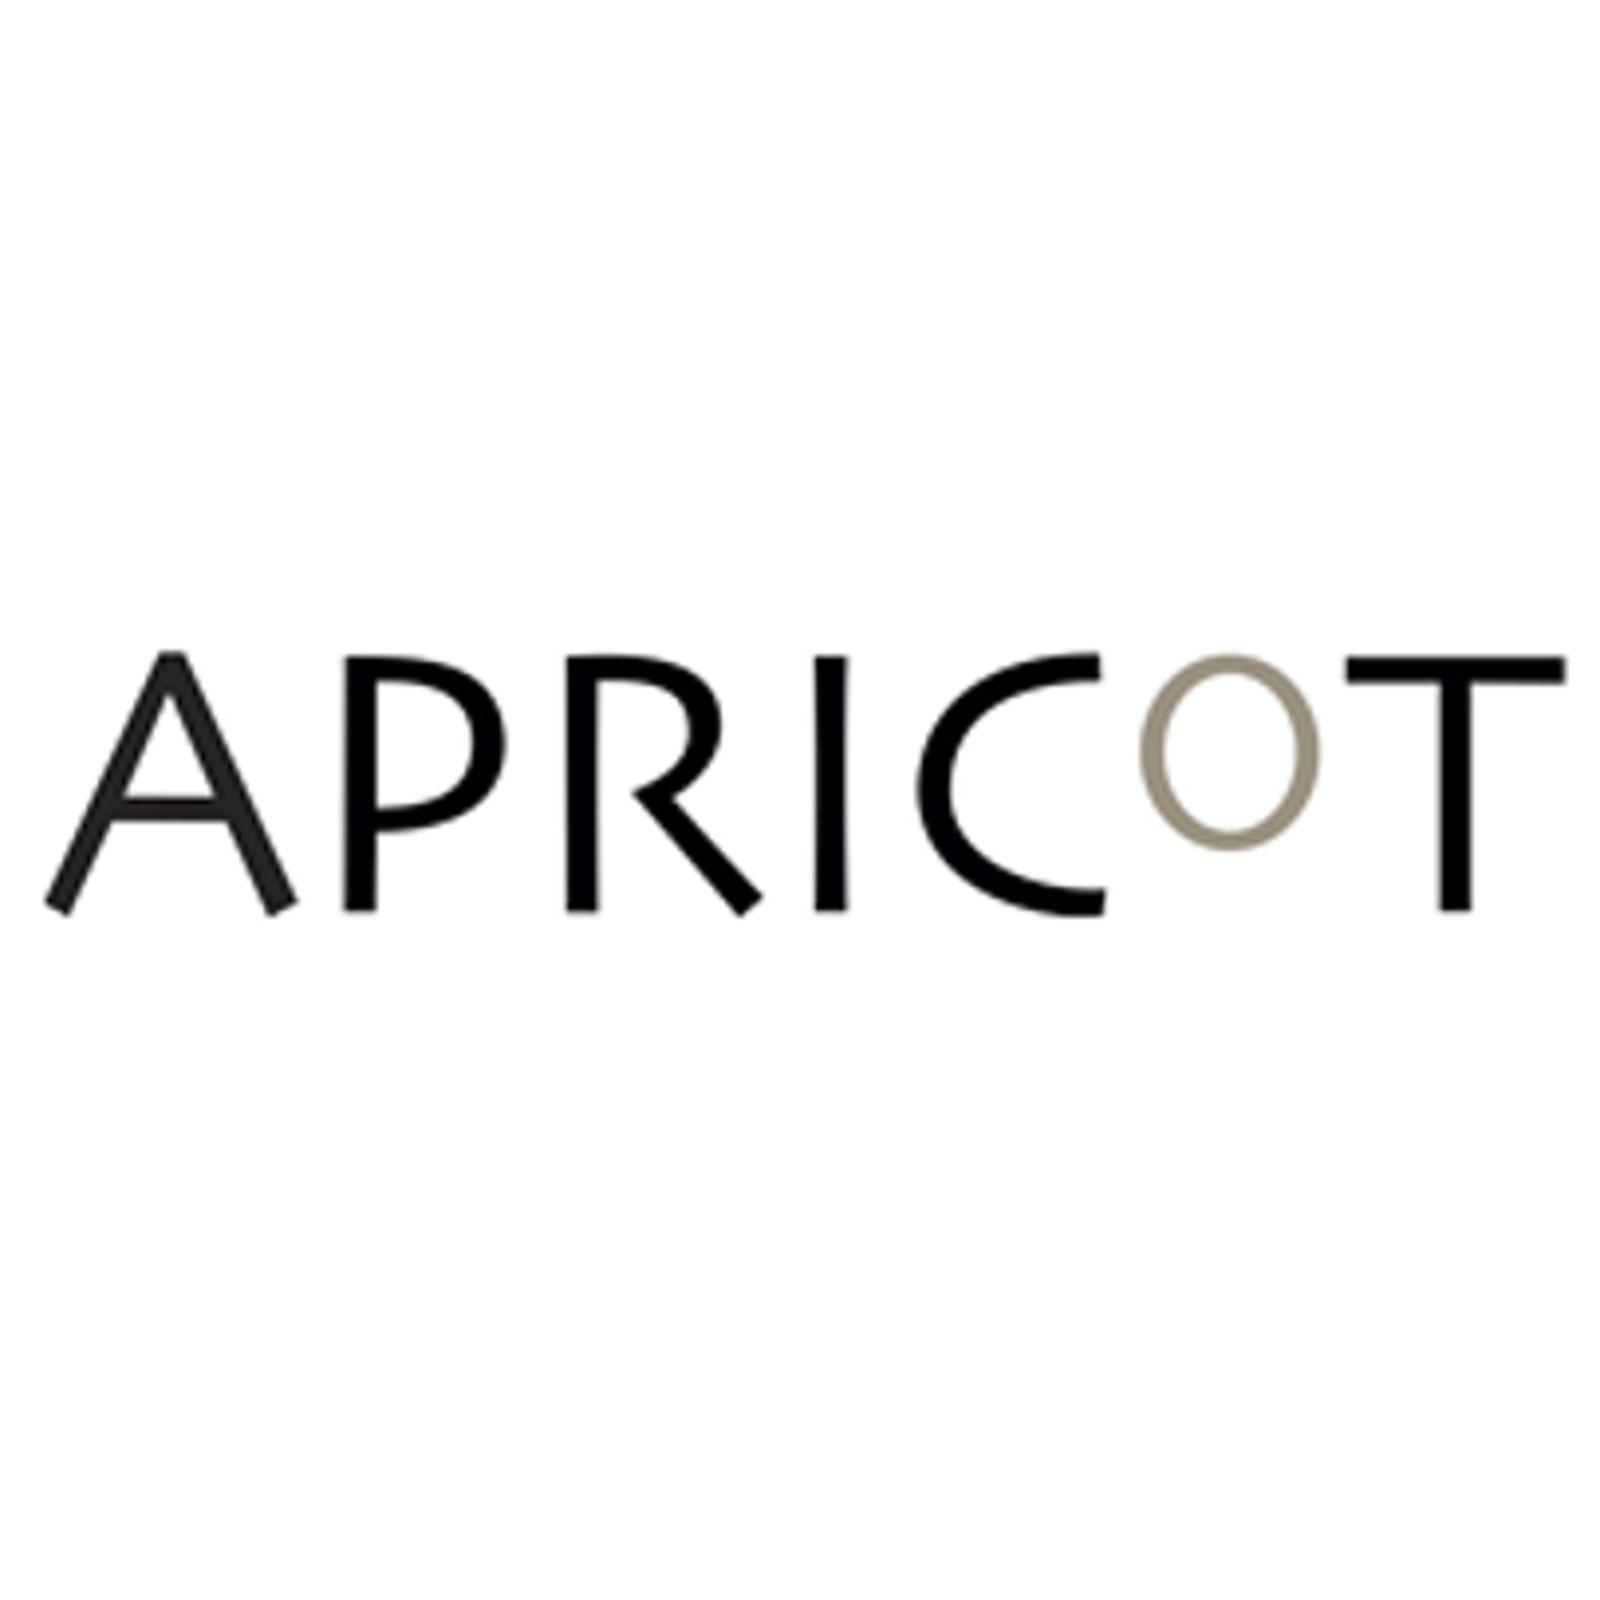 APRICOT (Image 1)